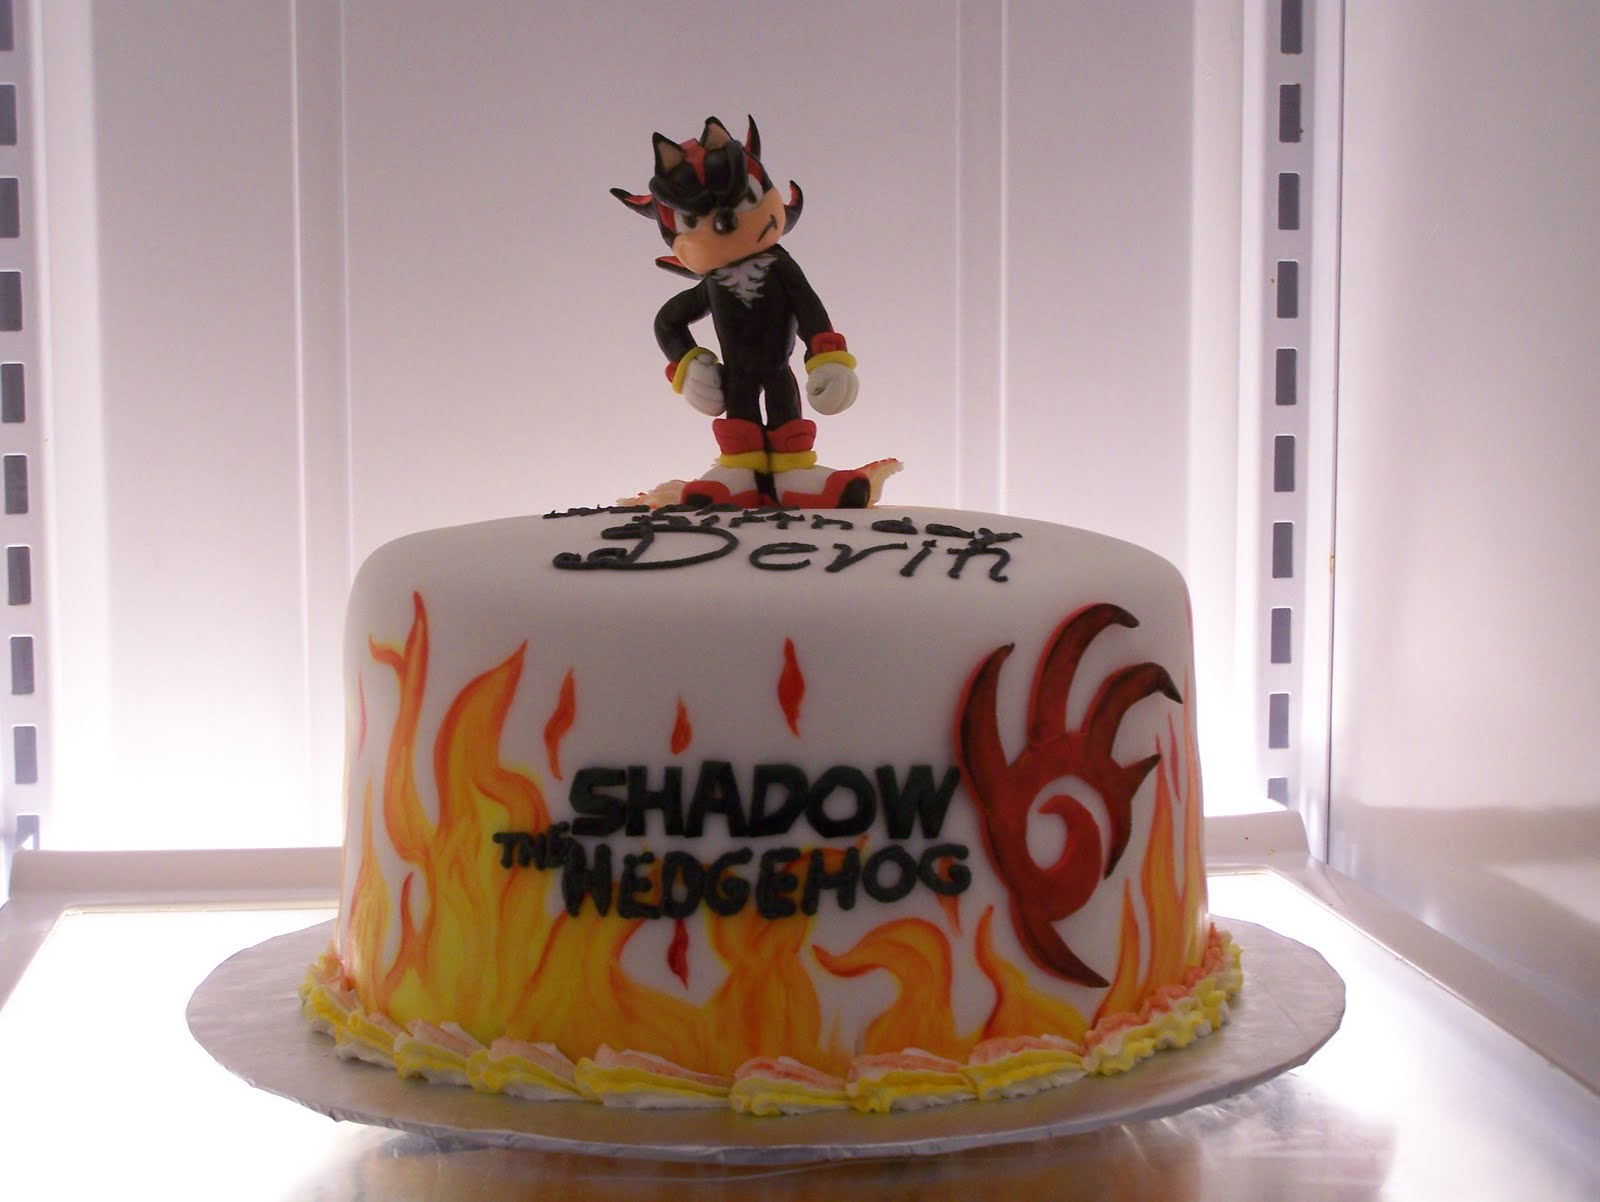 justbyme: Shadow the hedgehog cake